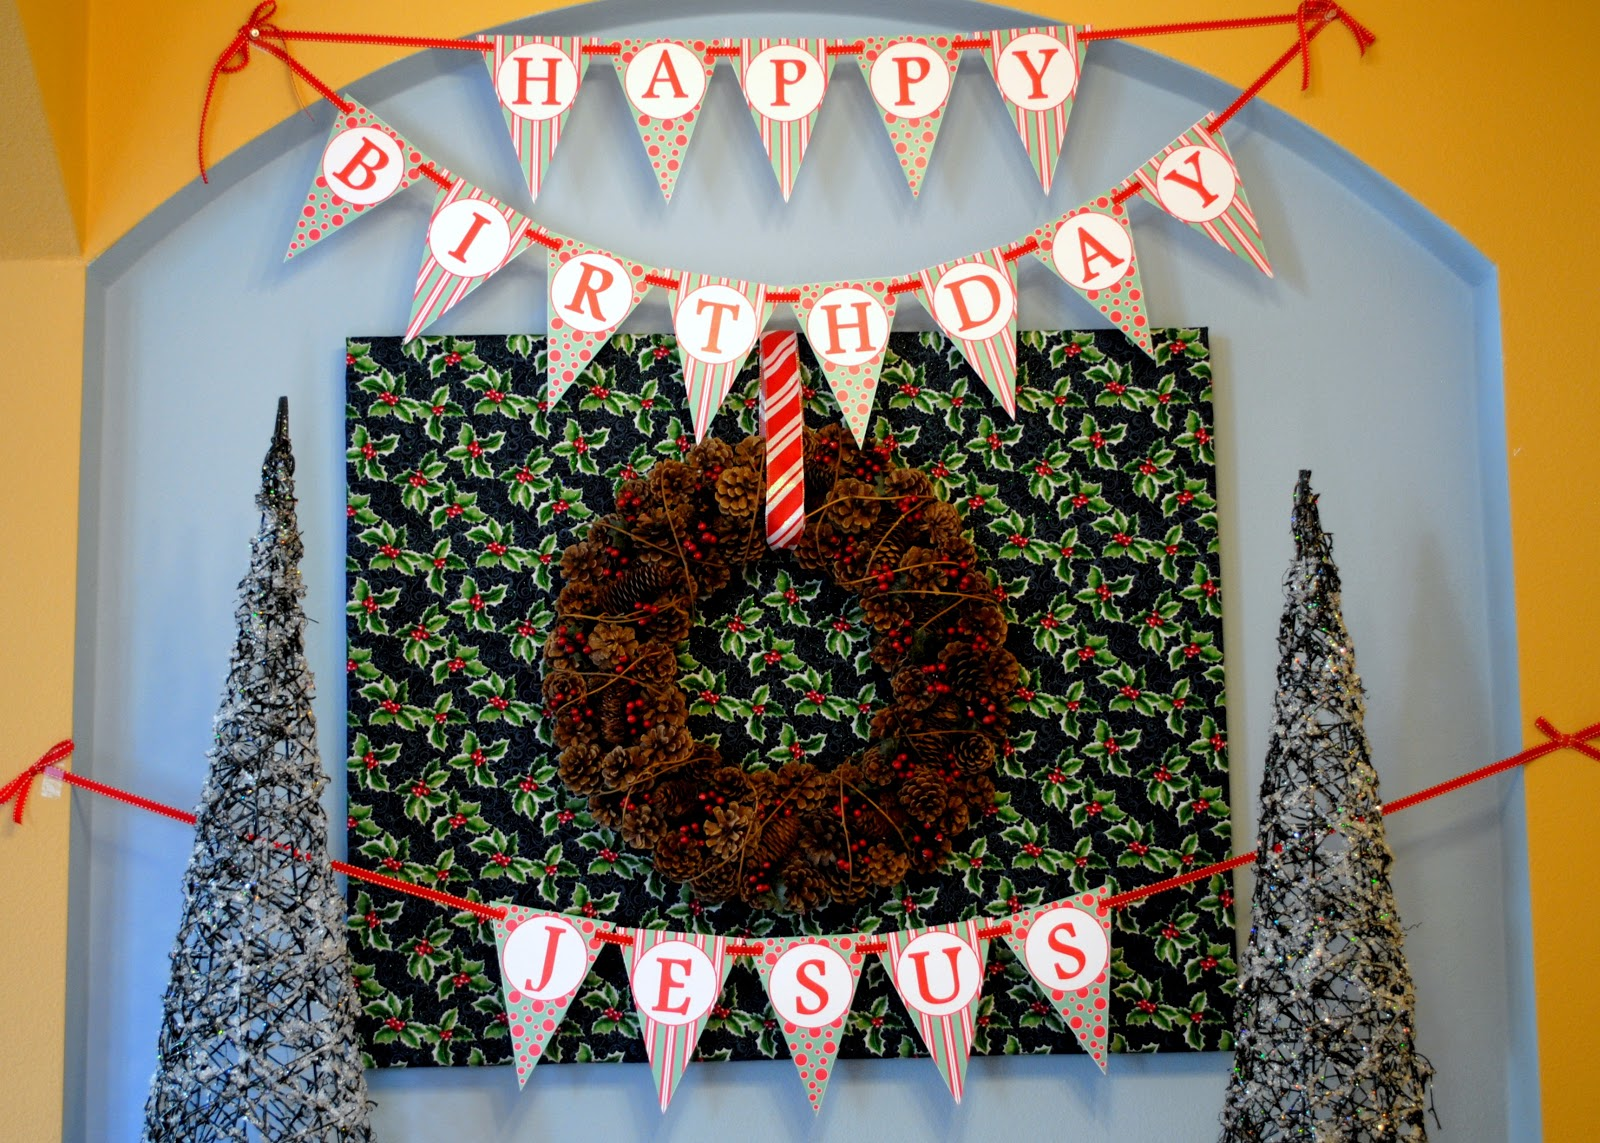 sweet metel moments free printable happy birthday jesus banner